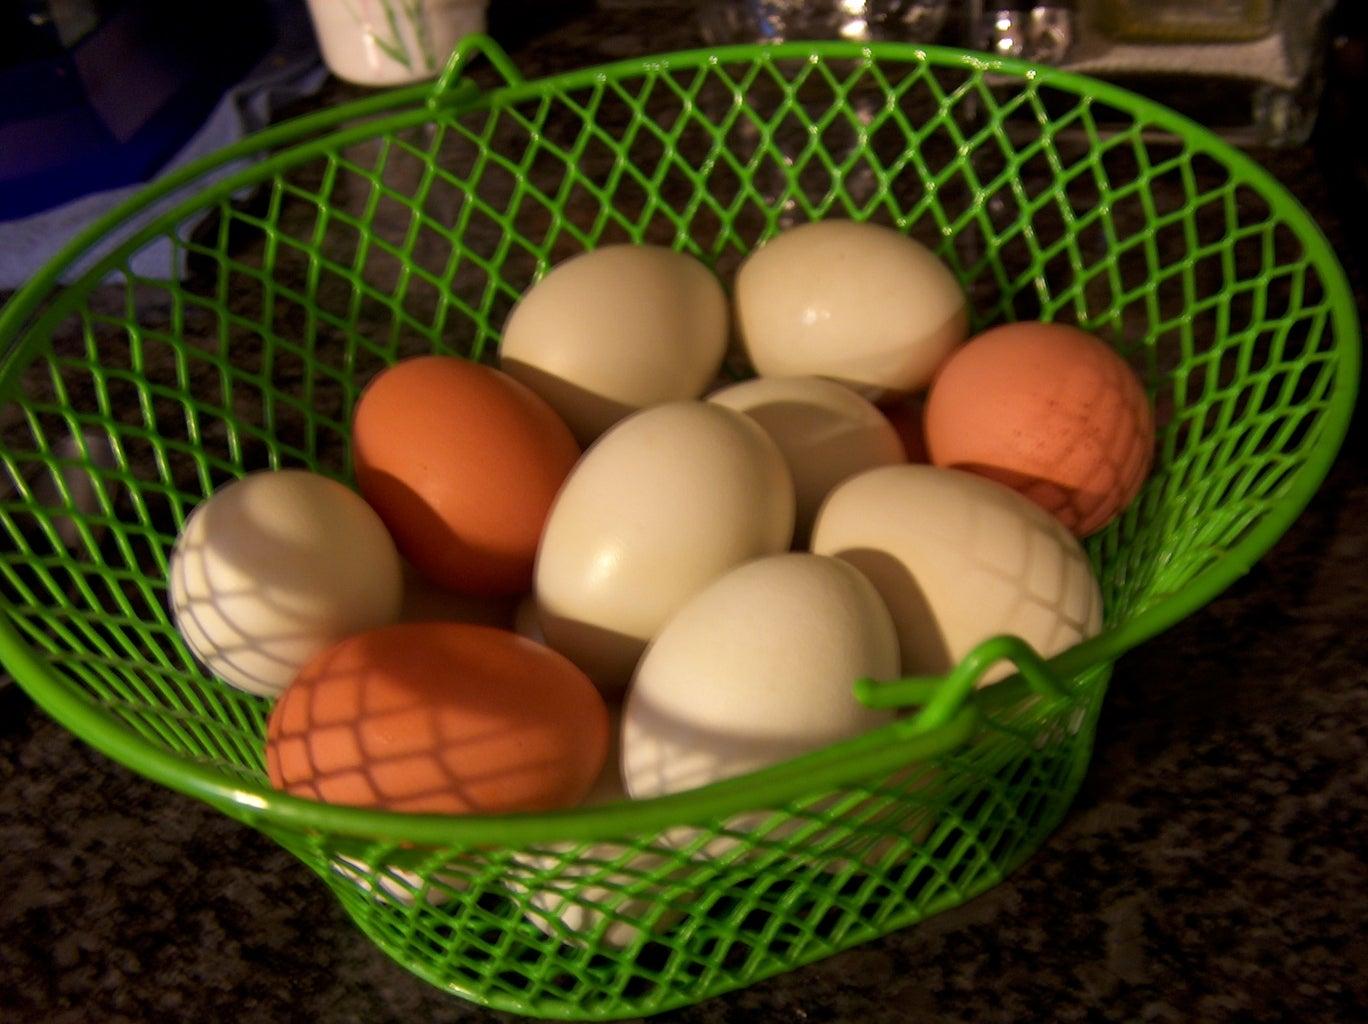 Making Hard Boiled Eggs With FRESH Eggs